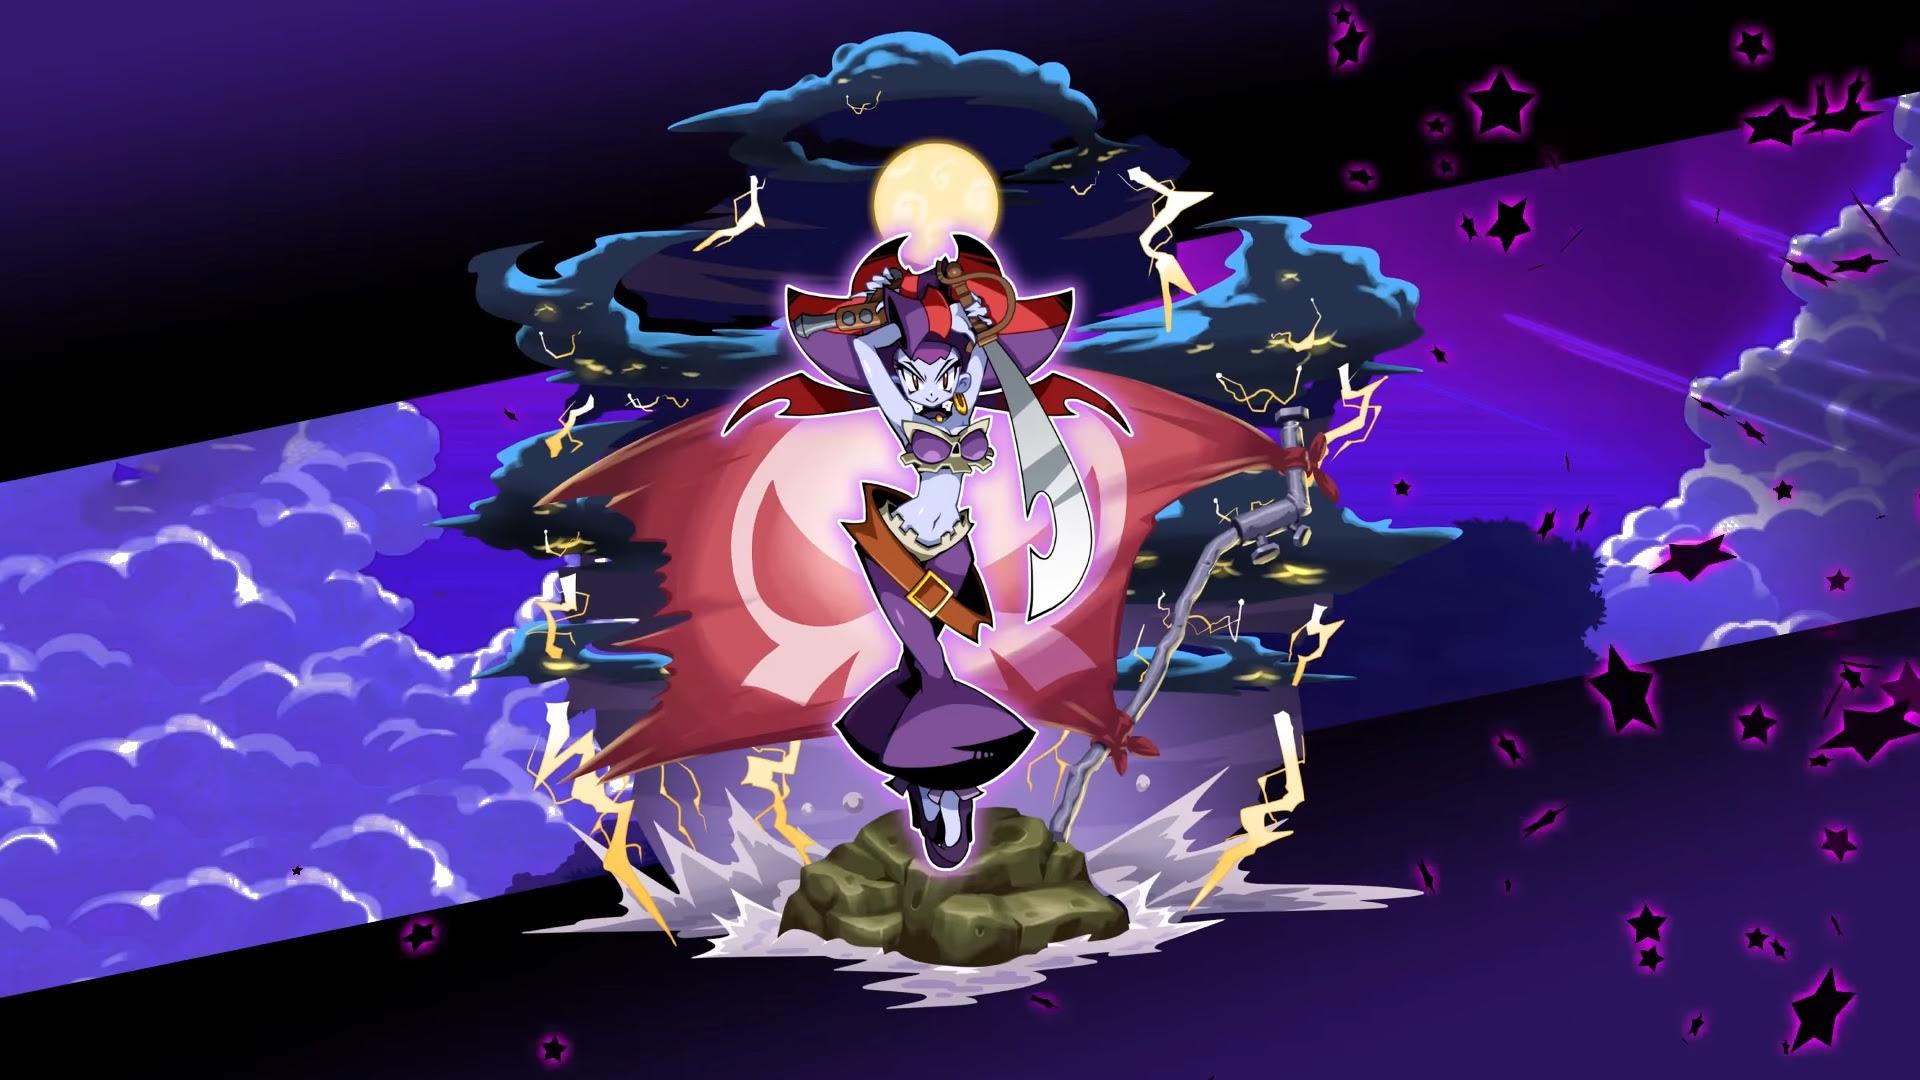 Shantae: Half-Genie Hero's DLC gets a little Risky screenshot